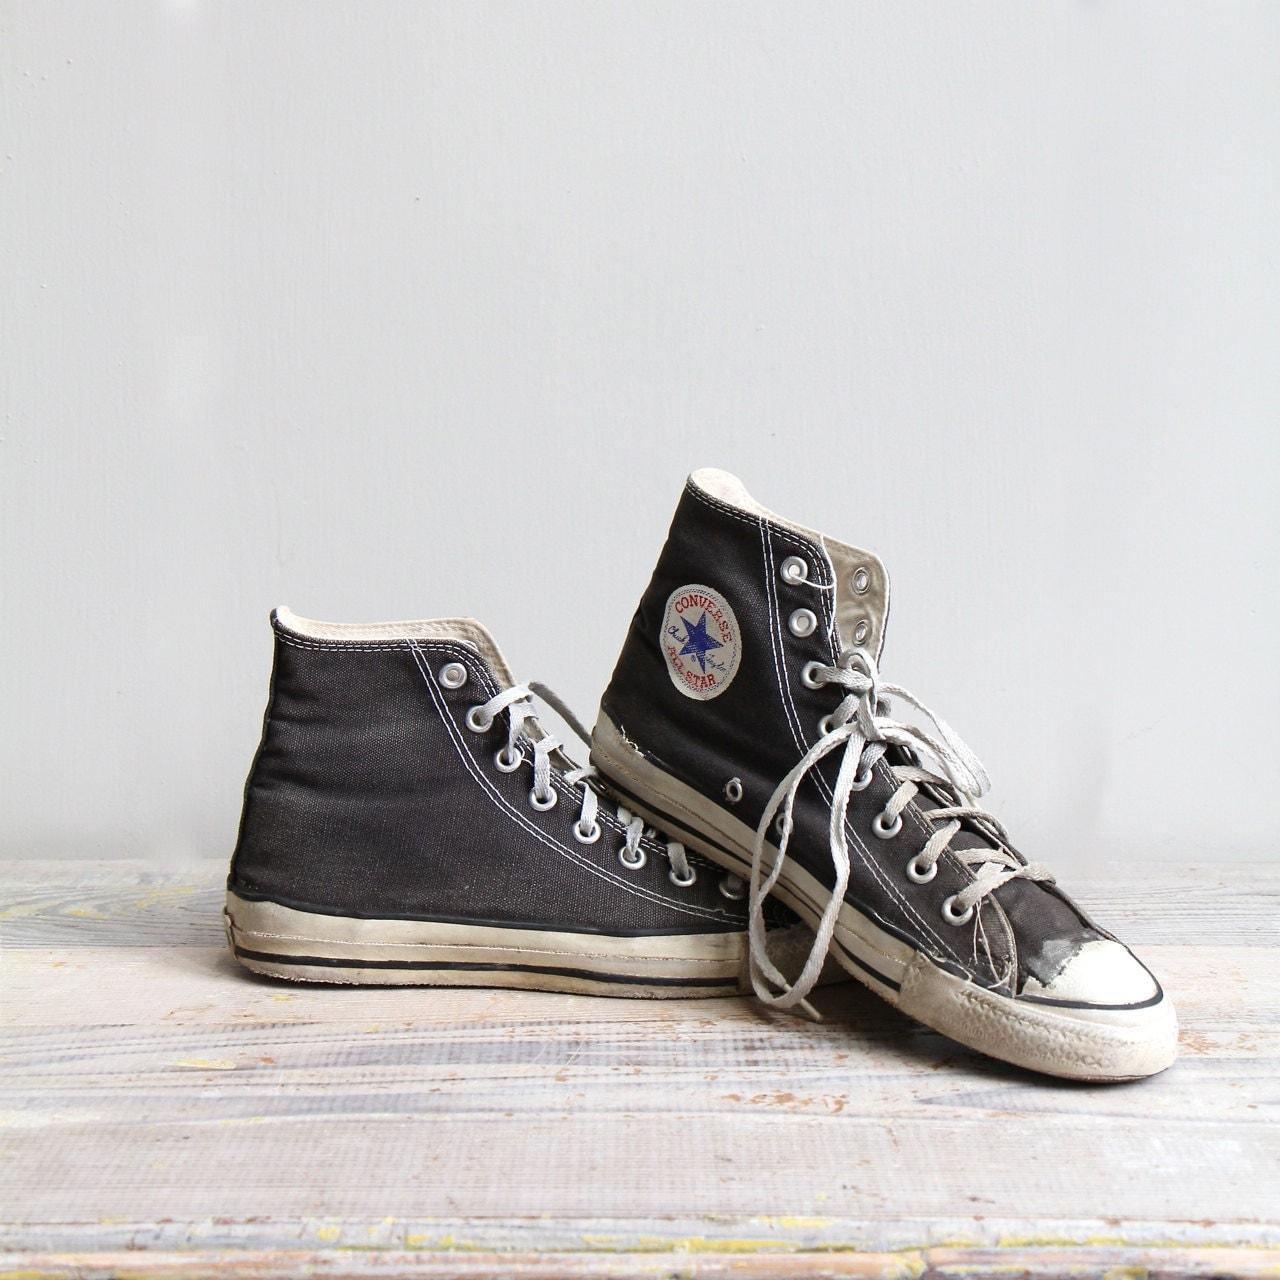 Vintage Converse High Tops 29